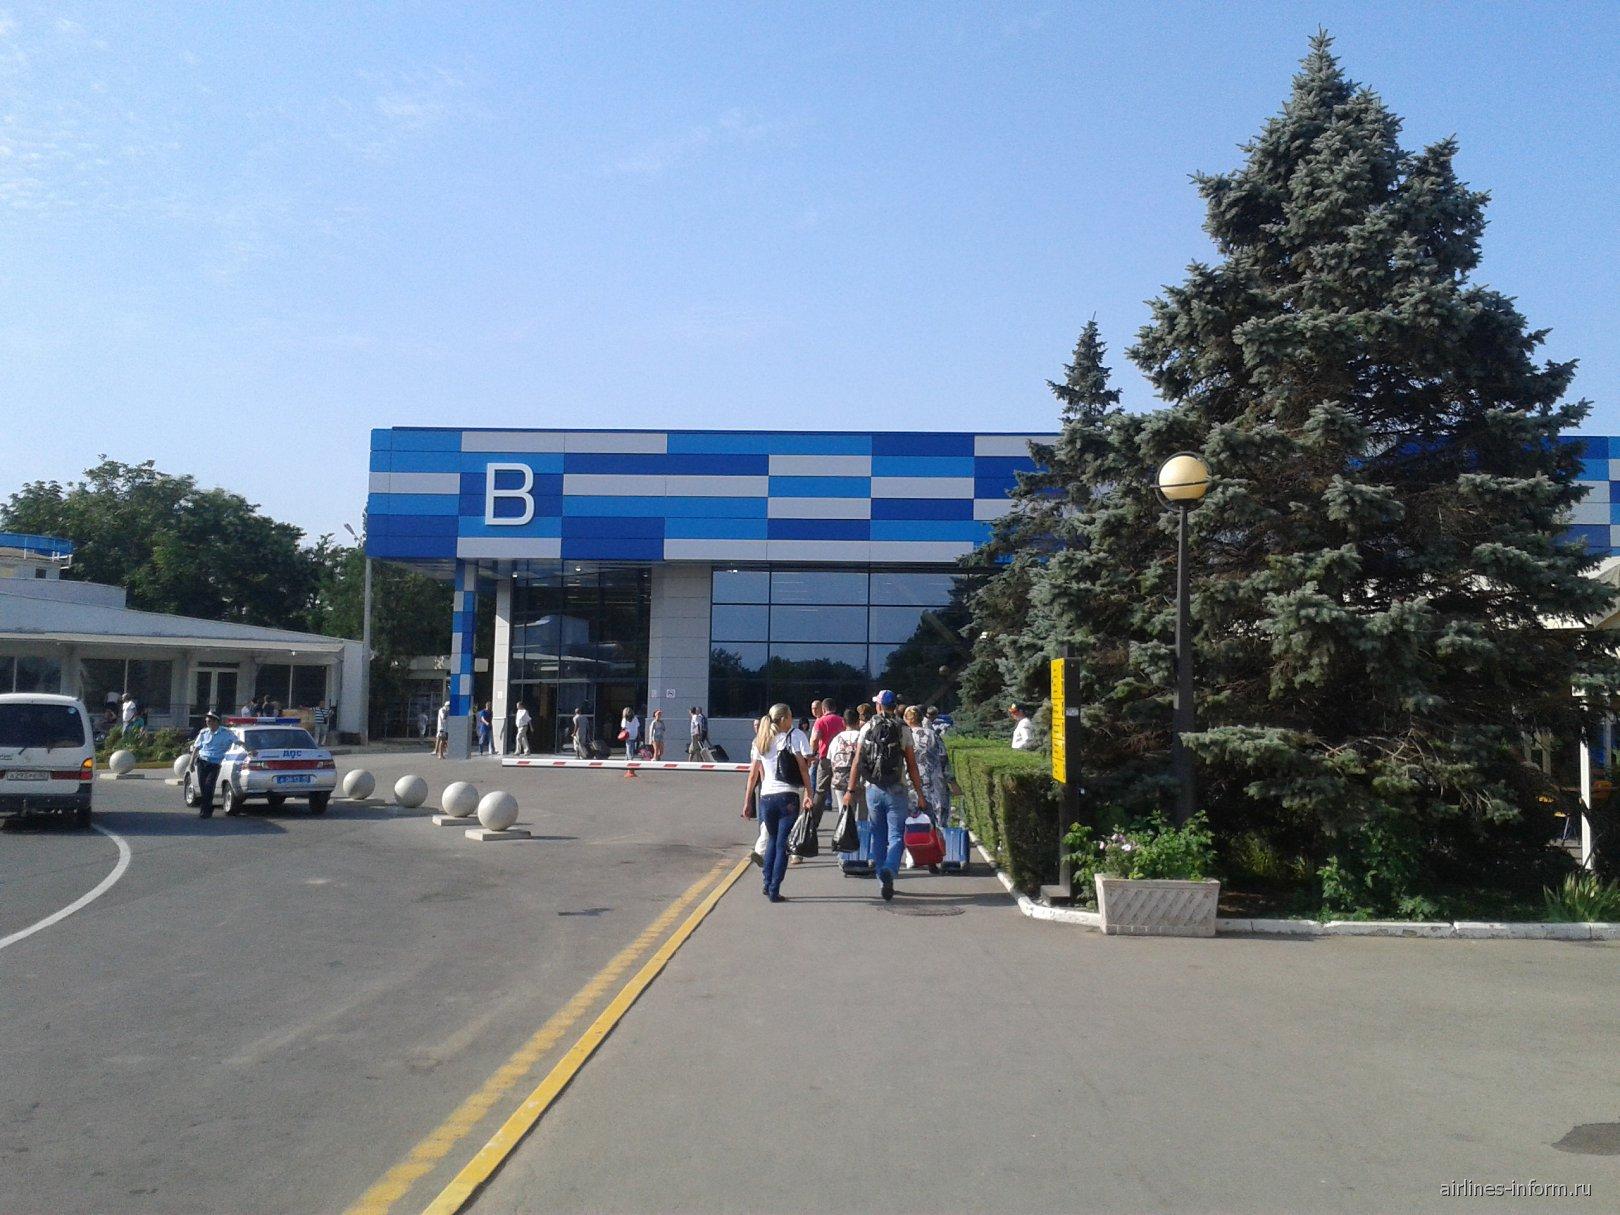 Терминал B аэропорта Симферополь